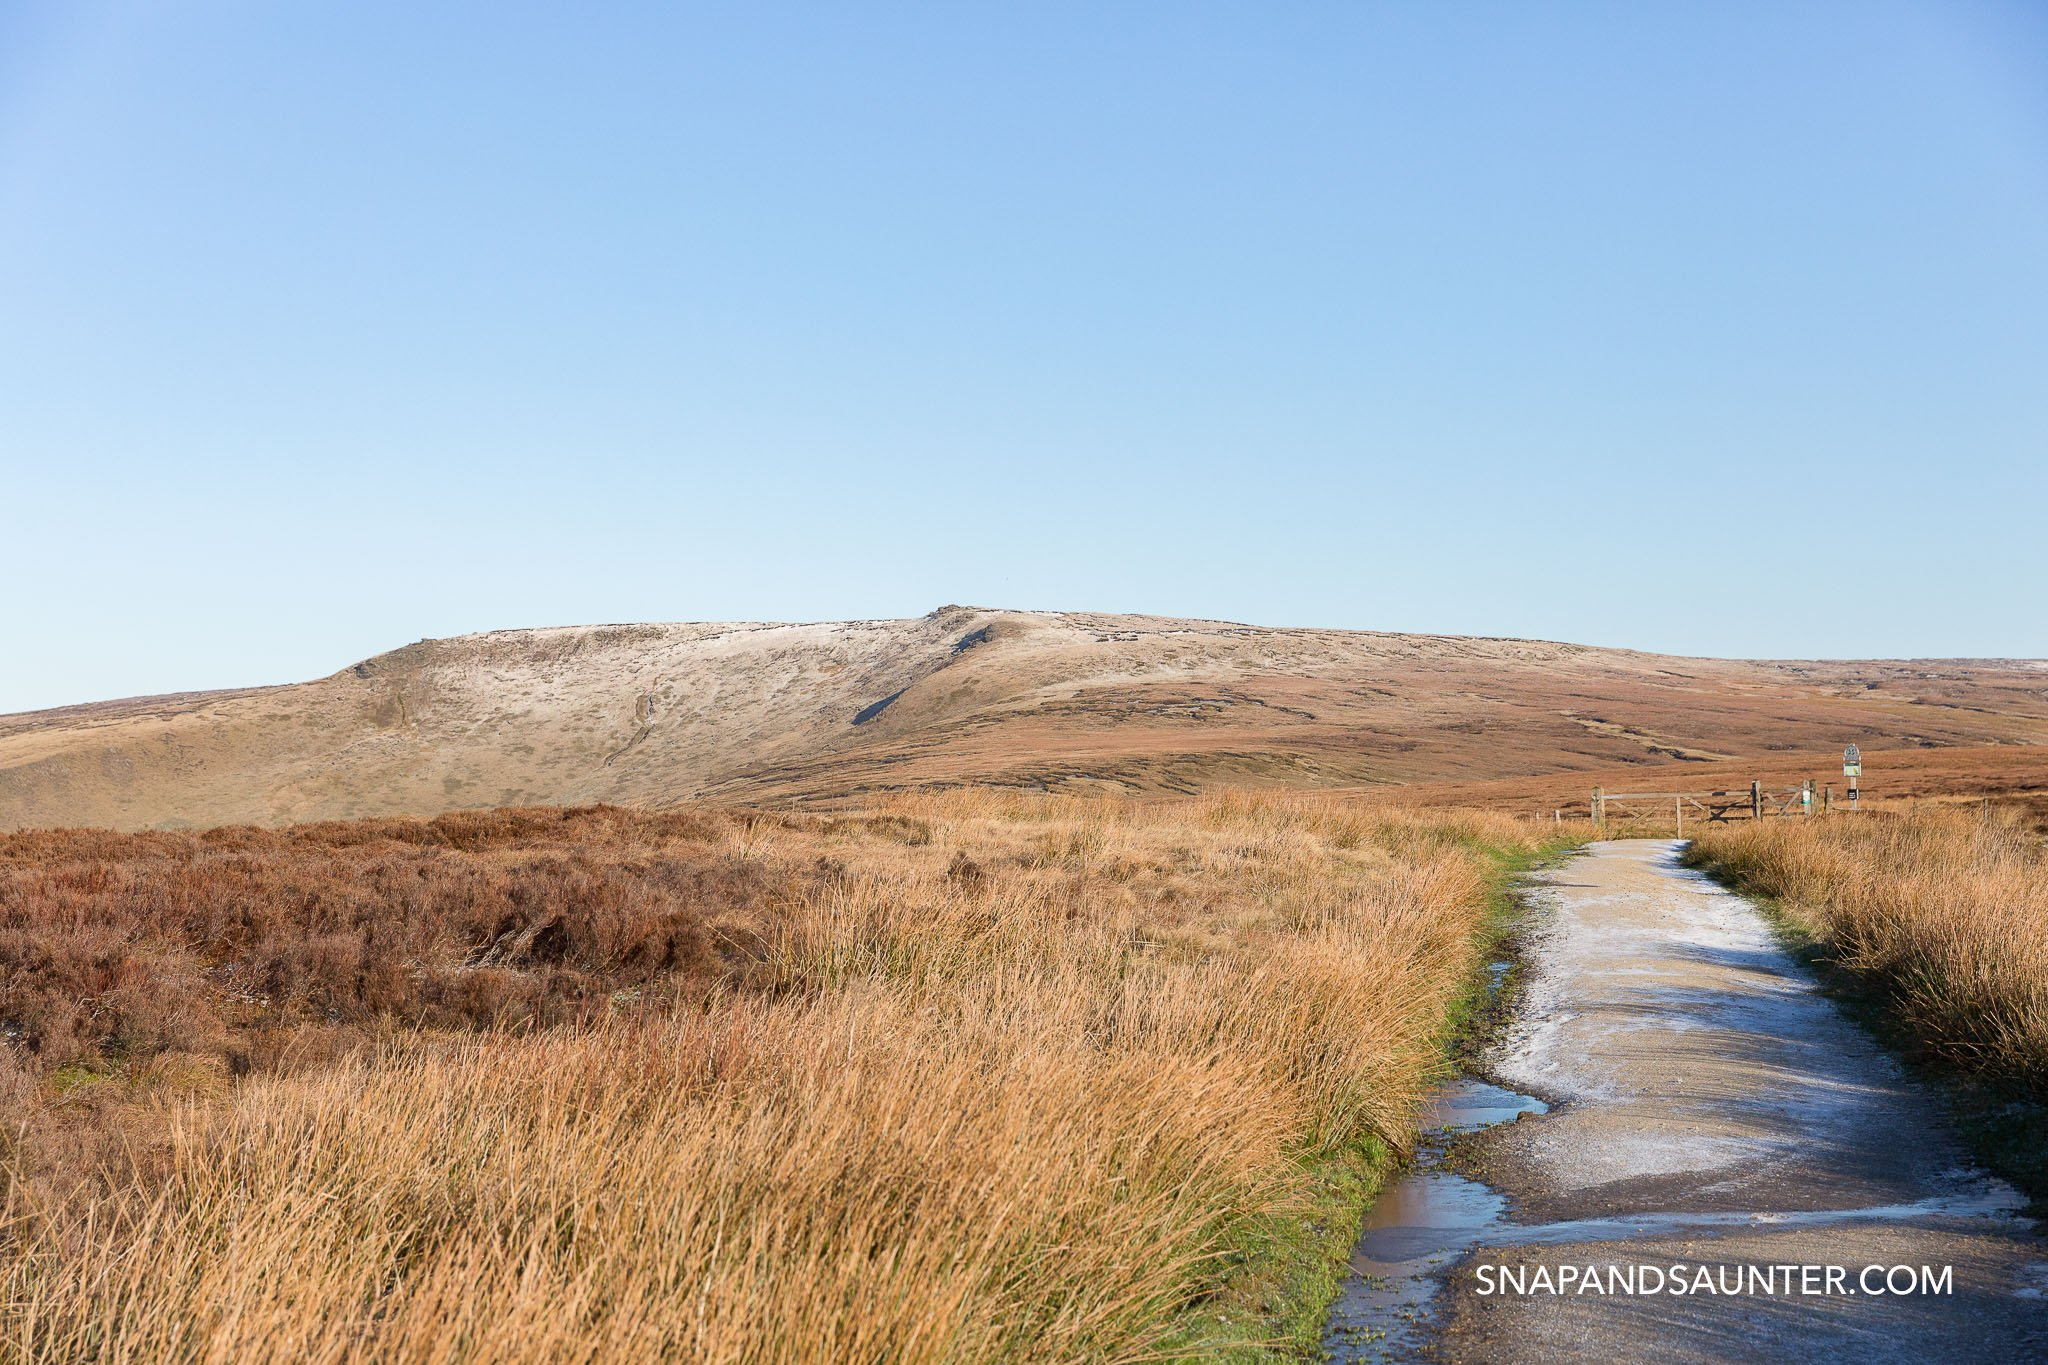 Pennine Way pathway in Bleaklow in Derbyshire part of the Peak District